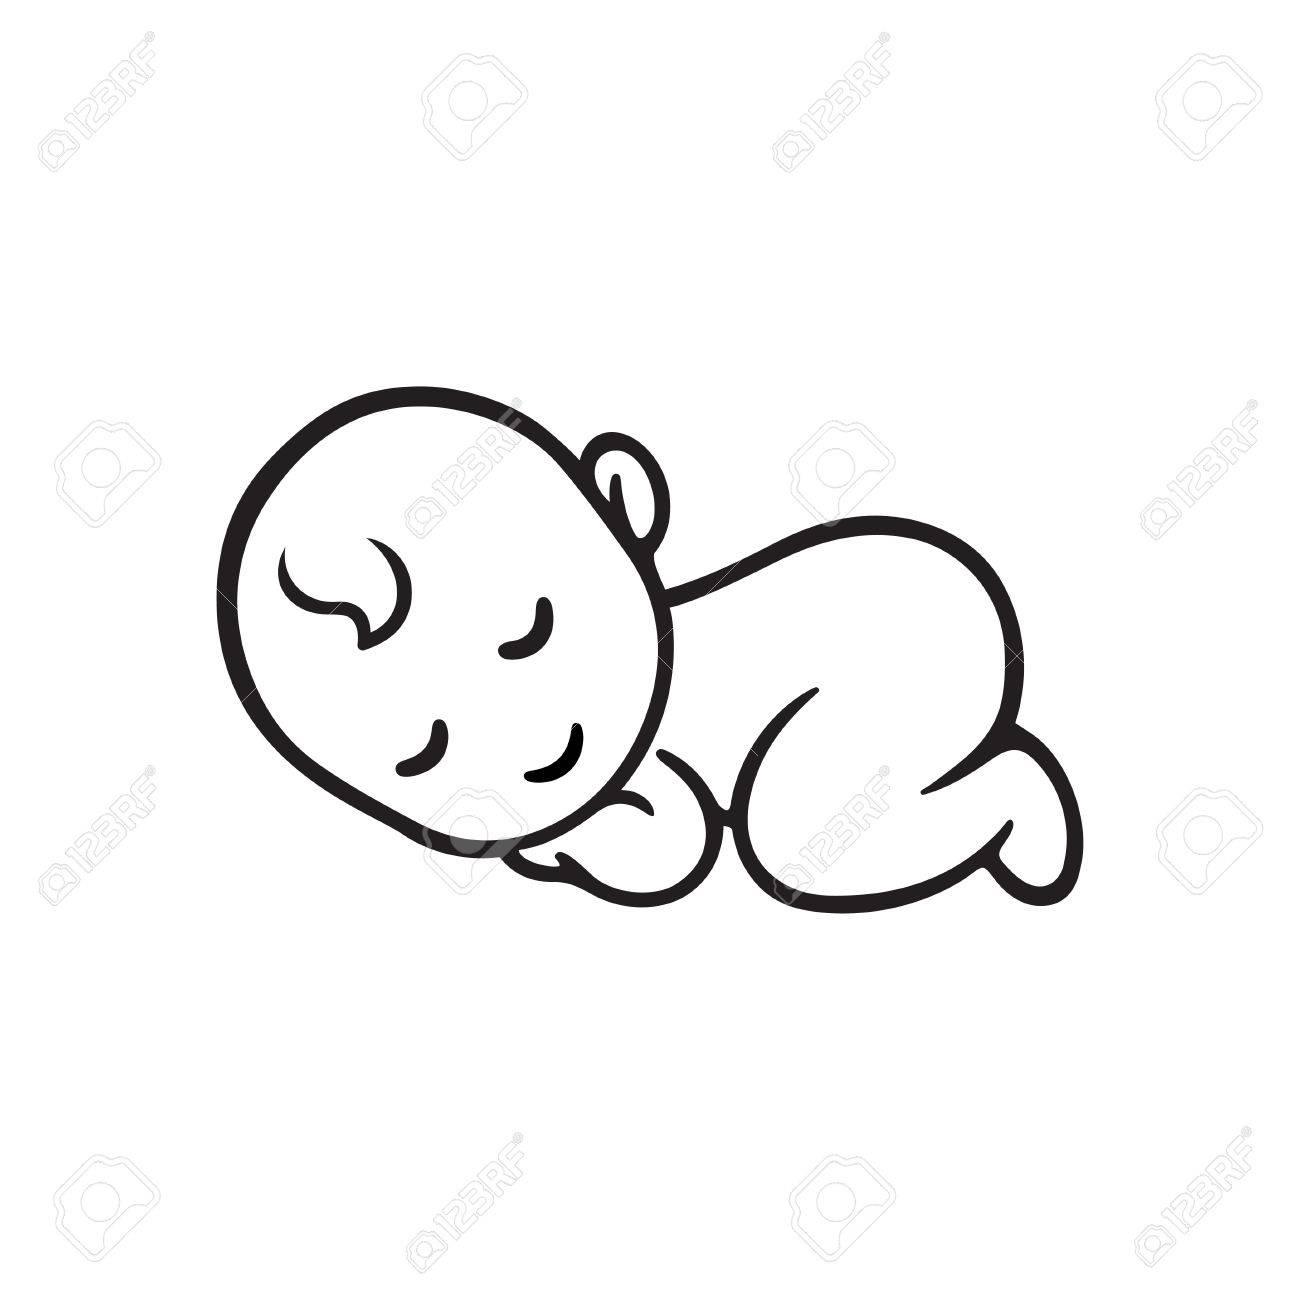 sleeping baby silhouette stylized line cute simple vector rh 123rf com simple vector editor simple vector drawing